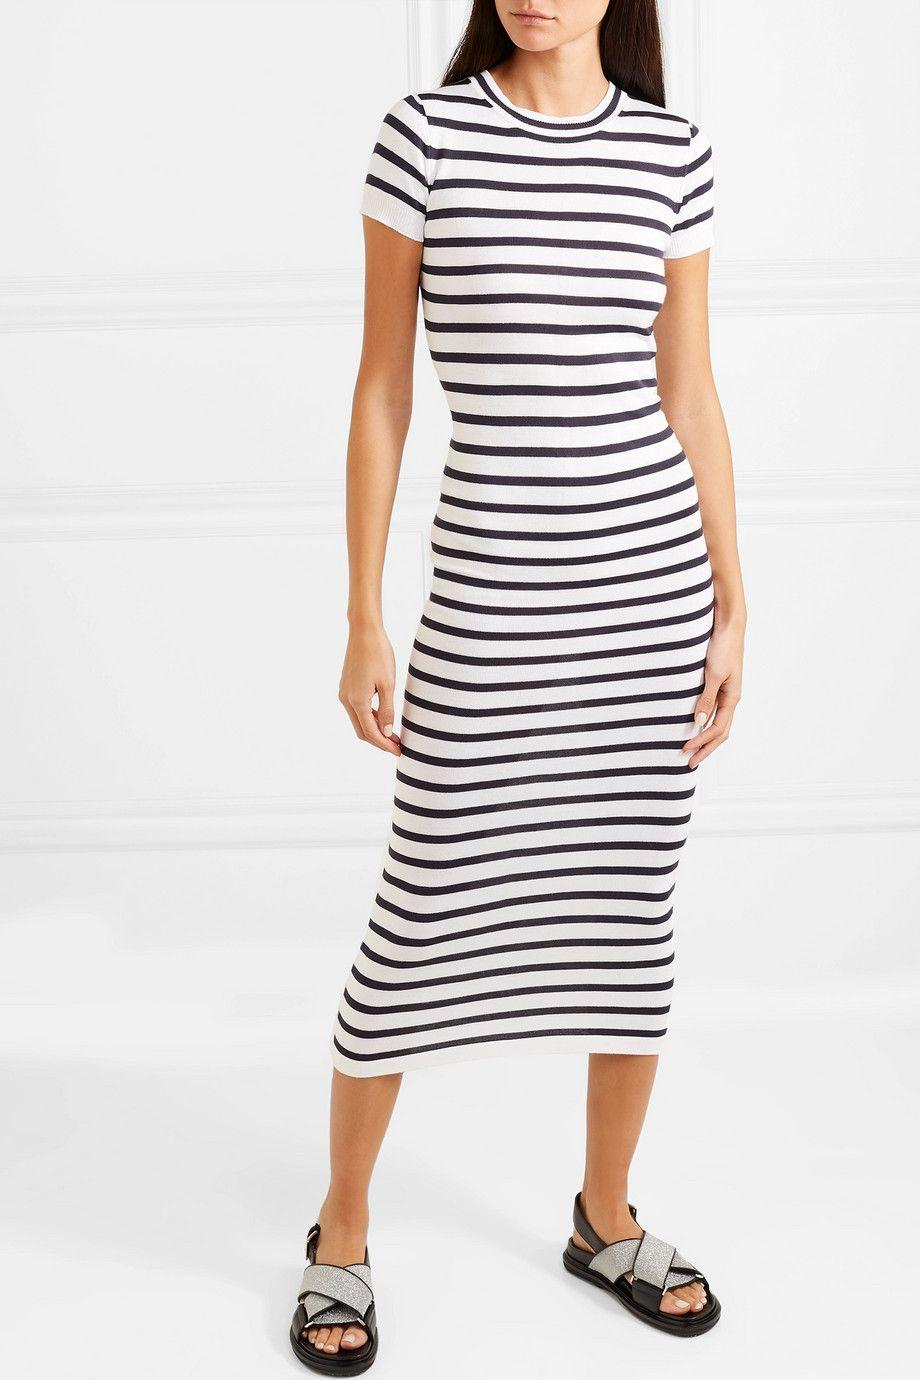 Paco Rabanne Striped Jersey Midi Dress Net A Porter Com Striped Jersey Short Sleeve Dresses Dresses [ 1380 x 920 Pixel ]